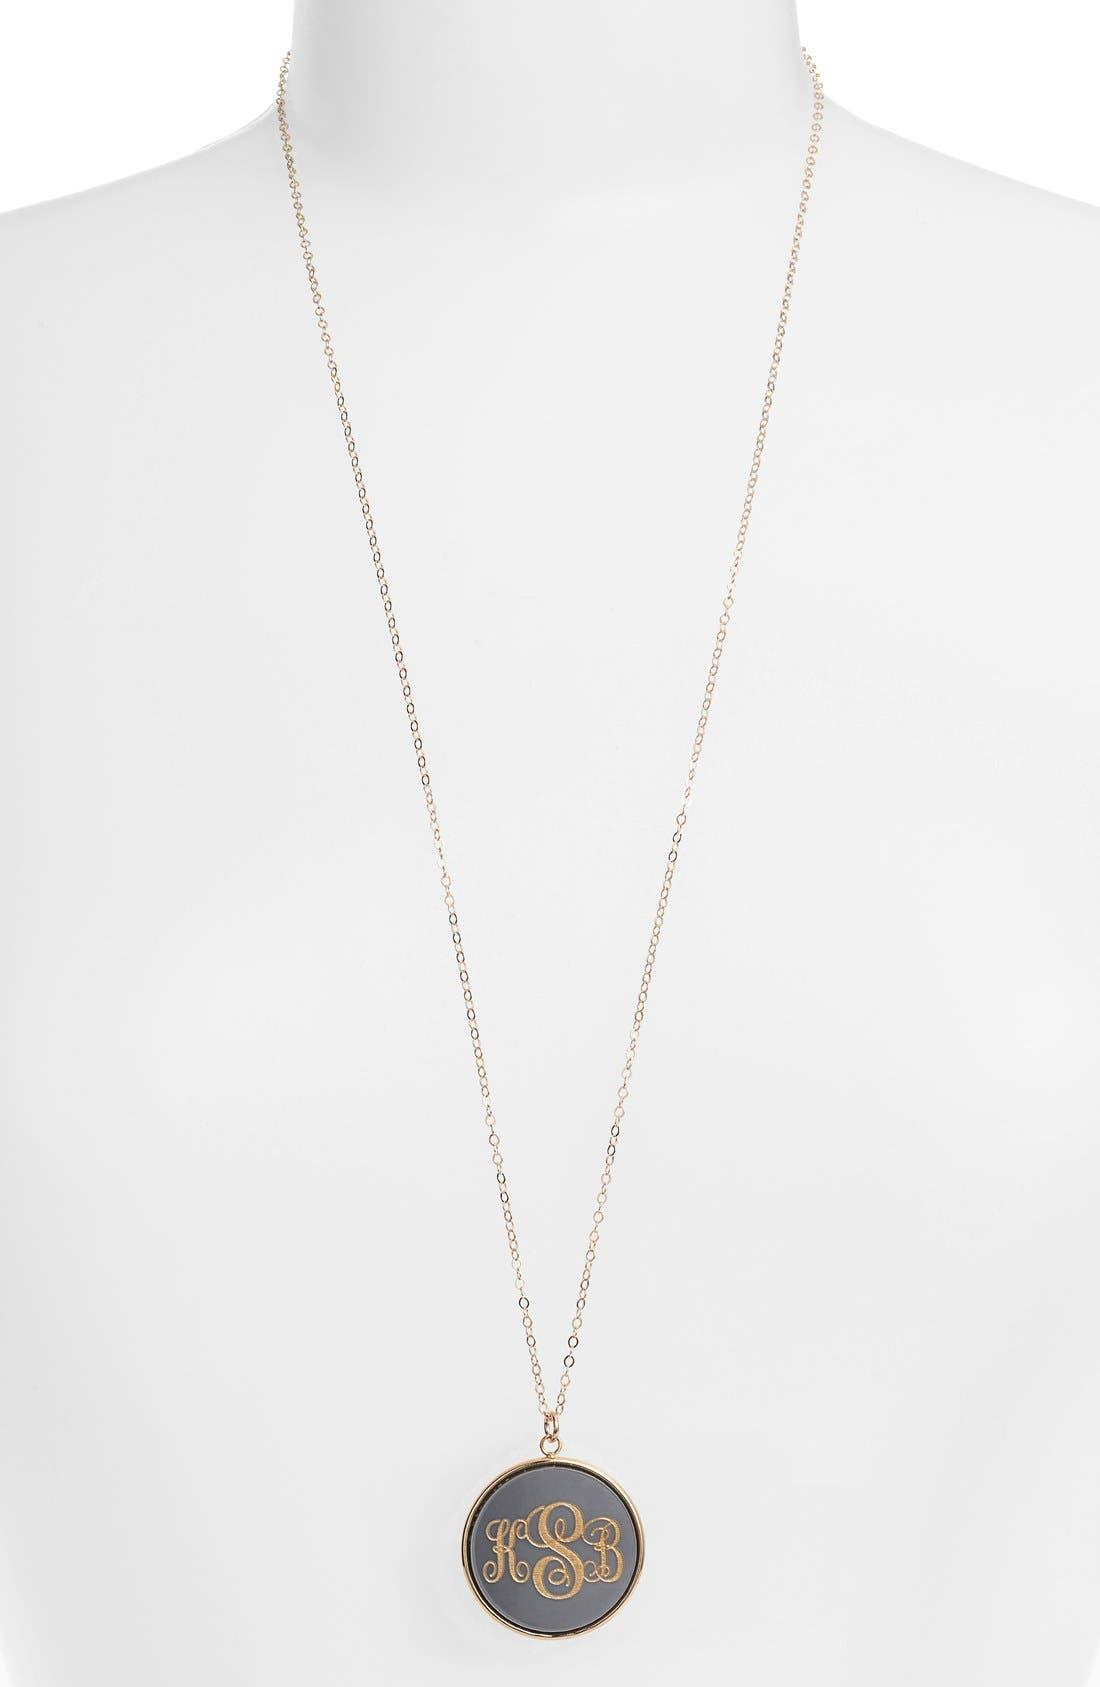 MOON AND LOLA Vineyard Personalized Monogram Pendant Necklace